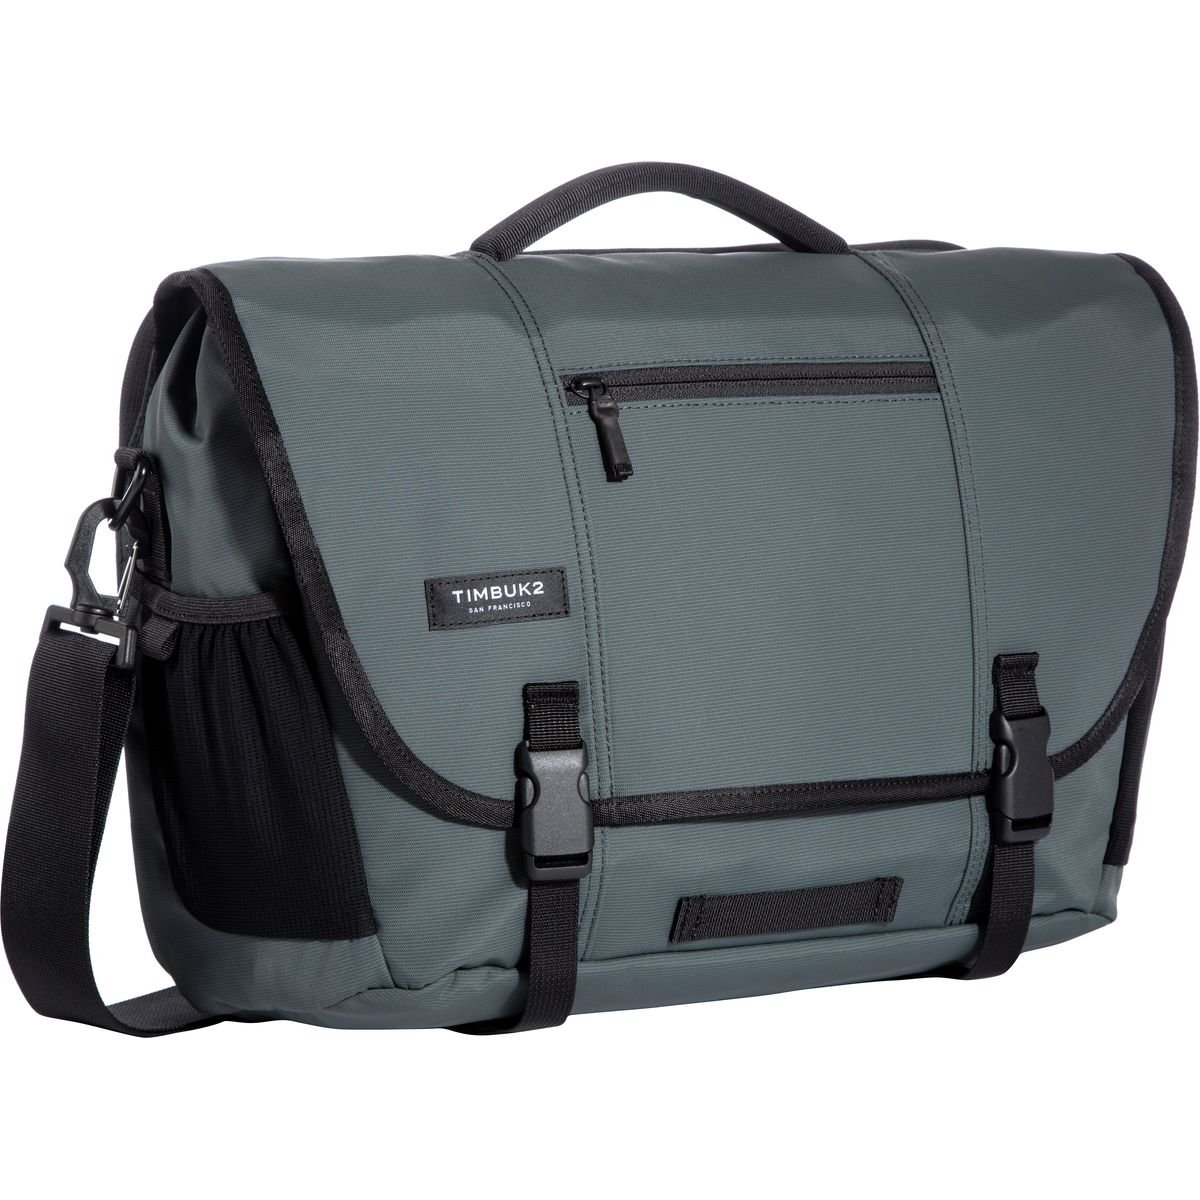 Timbuk2 Commute Messenger Bag, Surplus, M, Medium